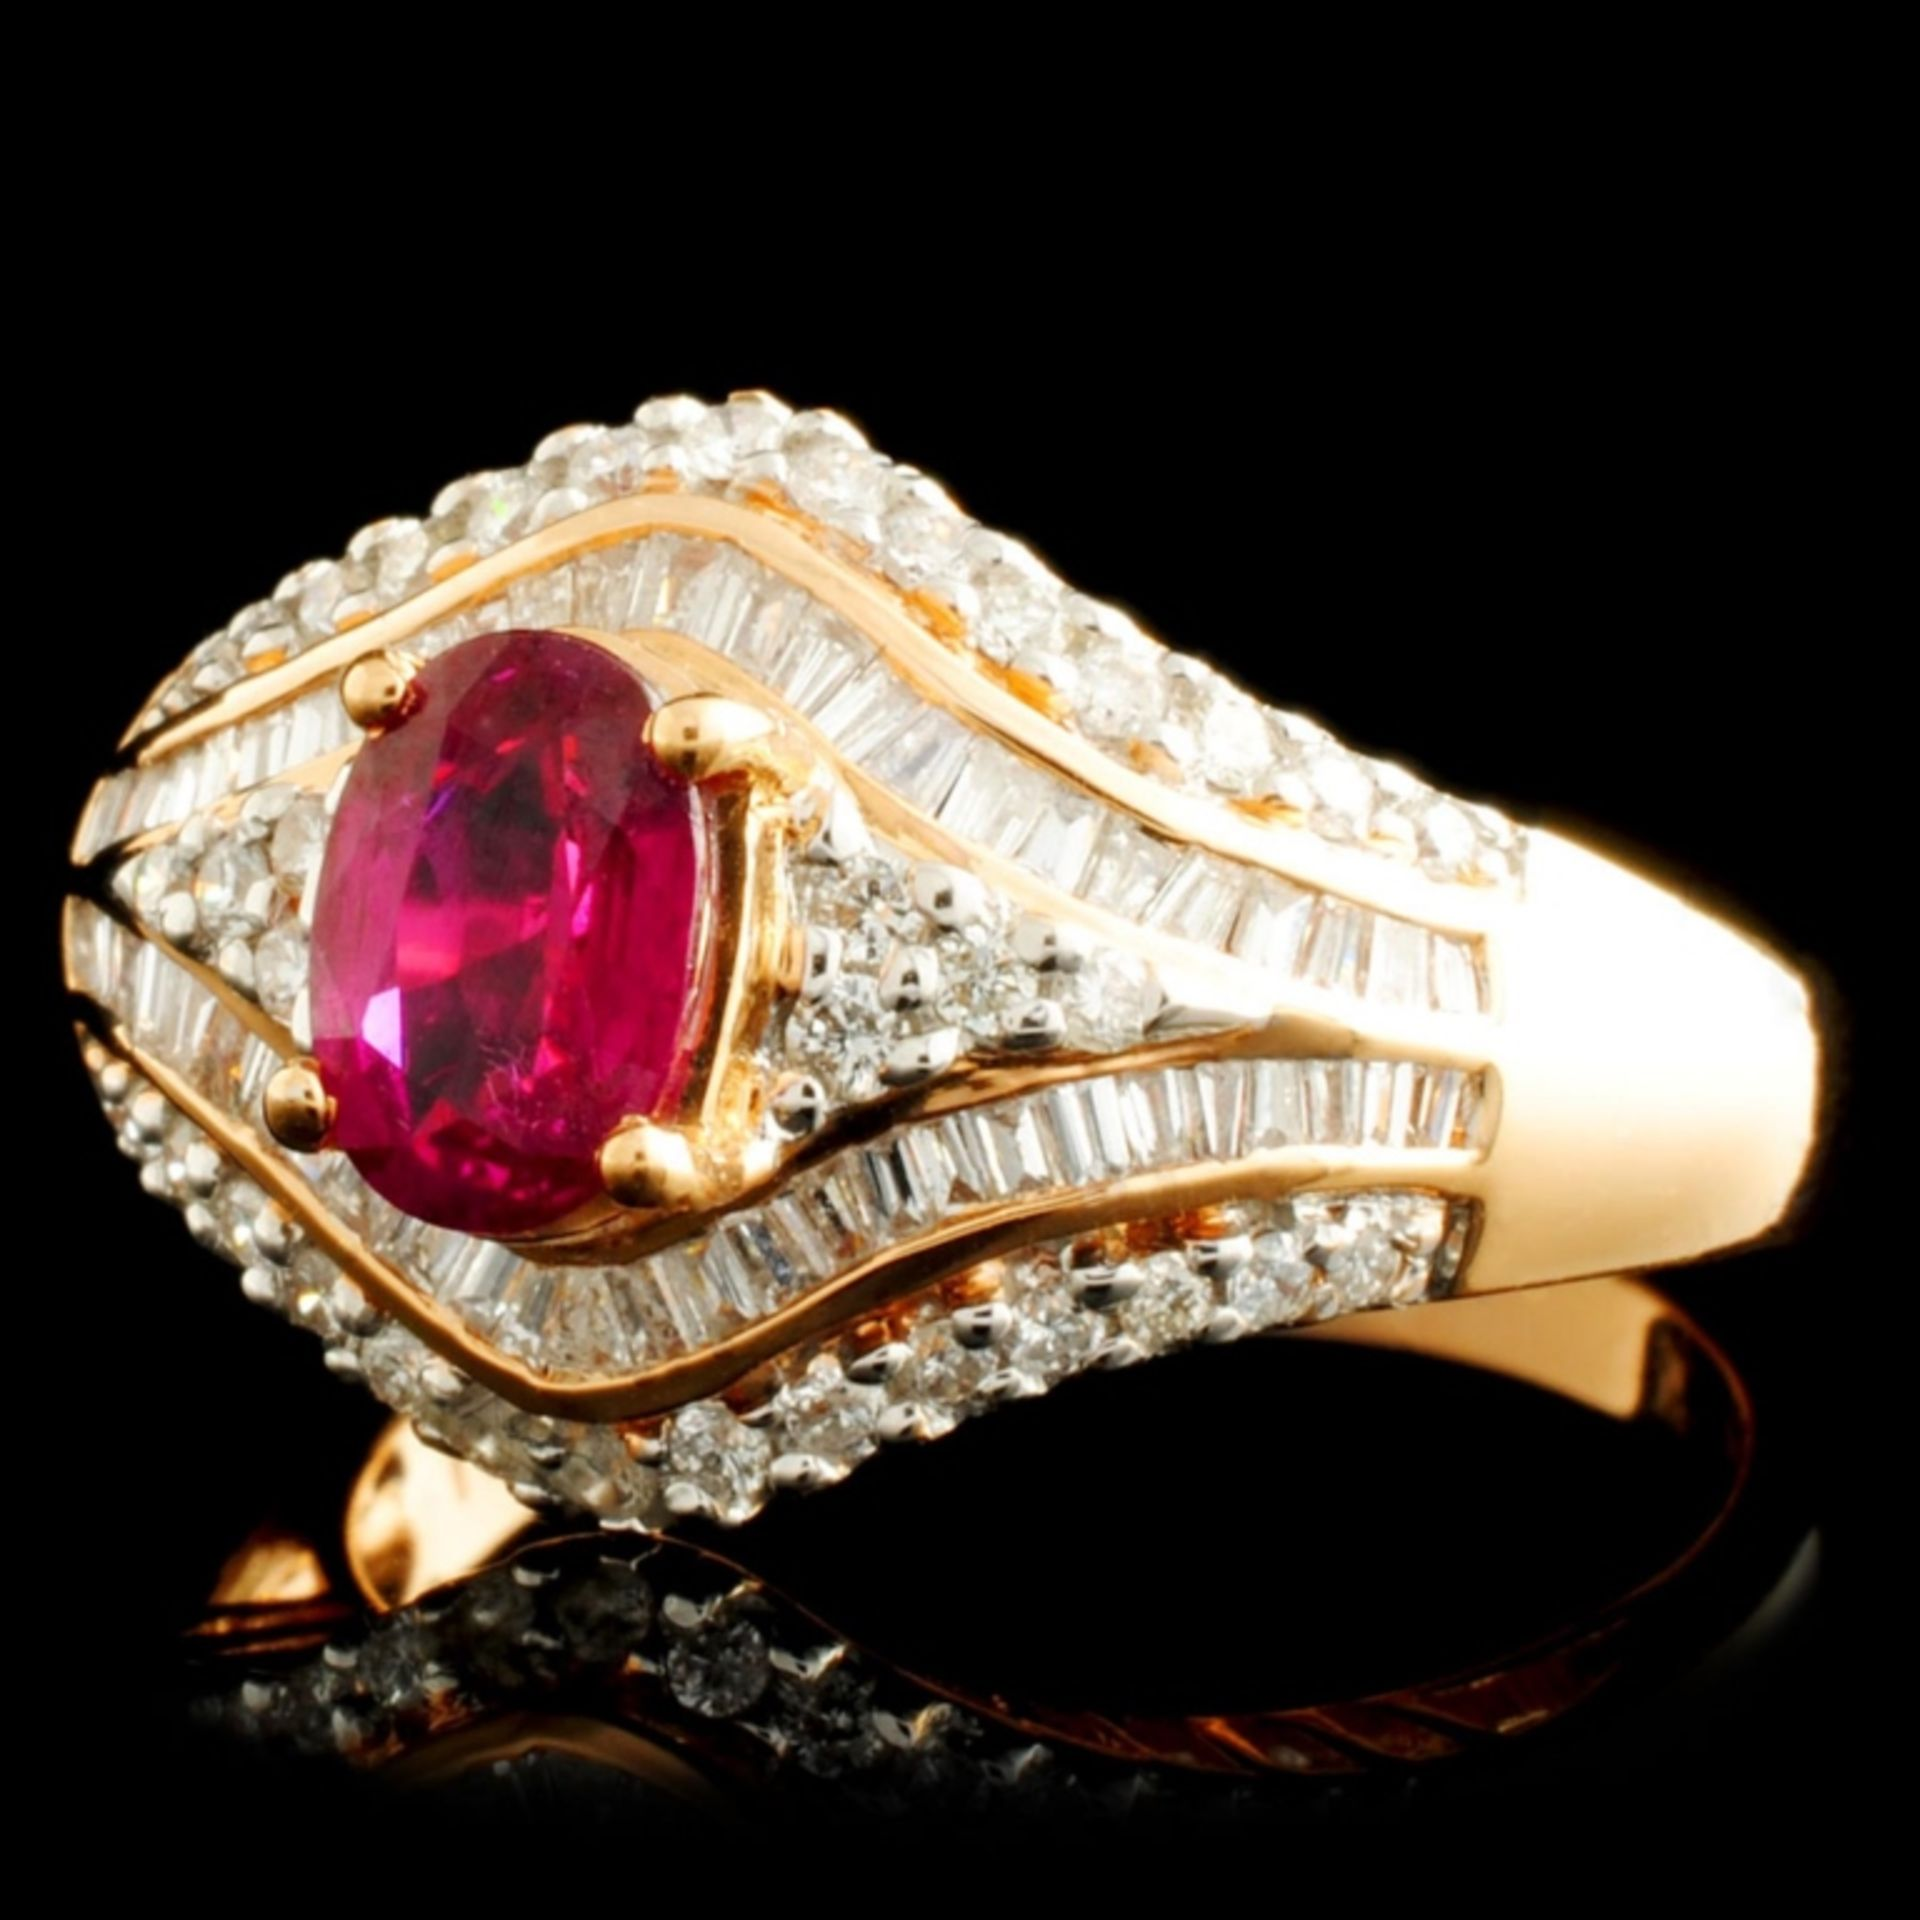 18K Gold 0.84ct Ruby & 0.60ctw Diamond Ring - Image 2 of 5